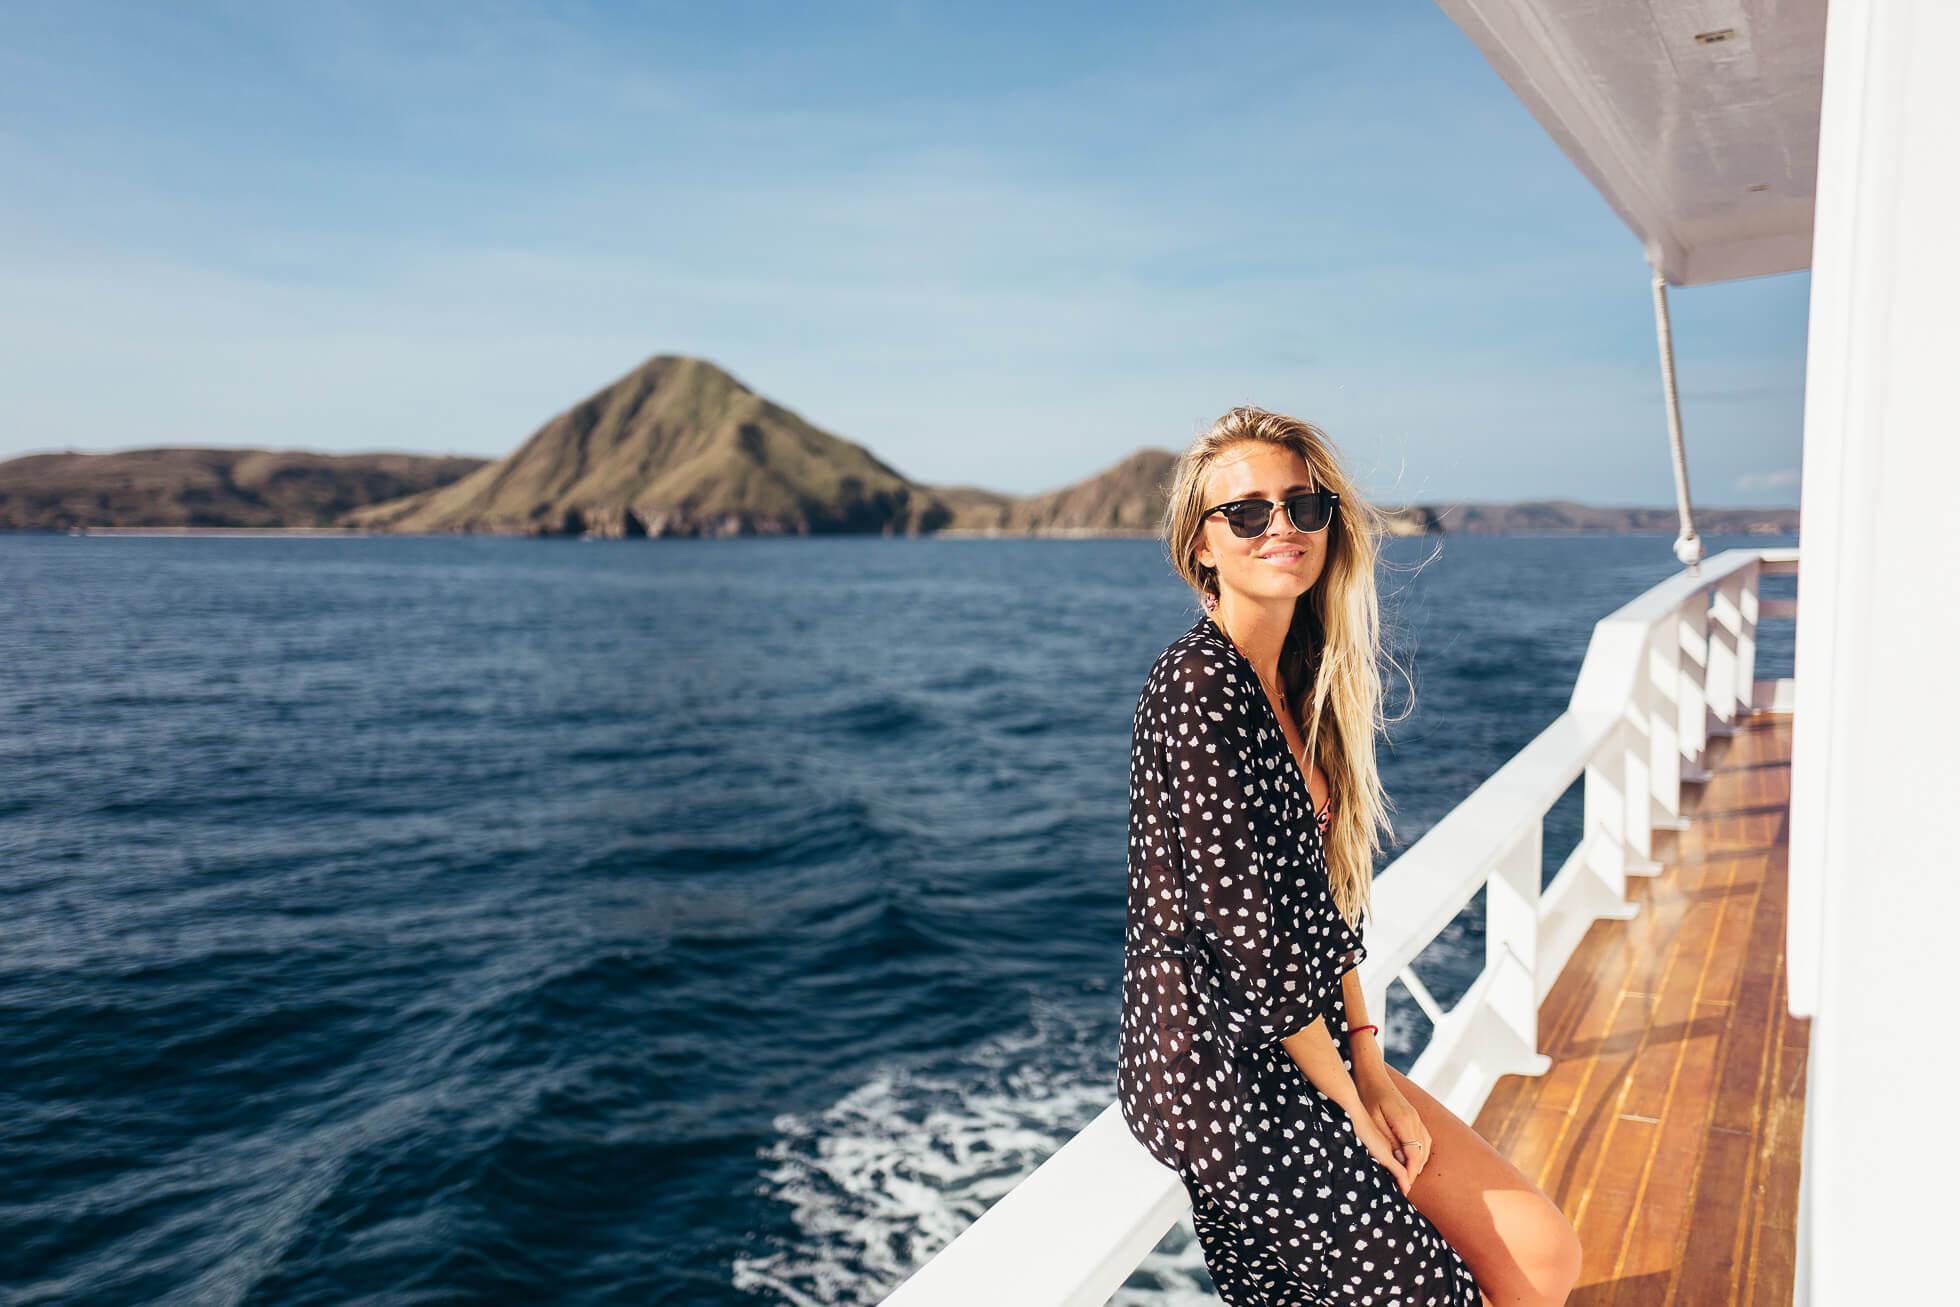 janni-deler-mer-sea-boatL1020227